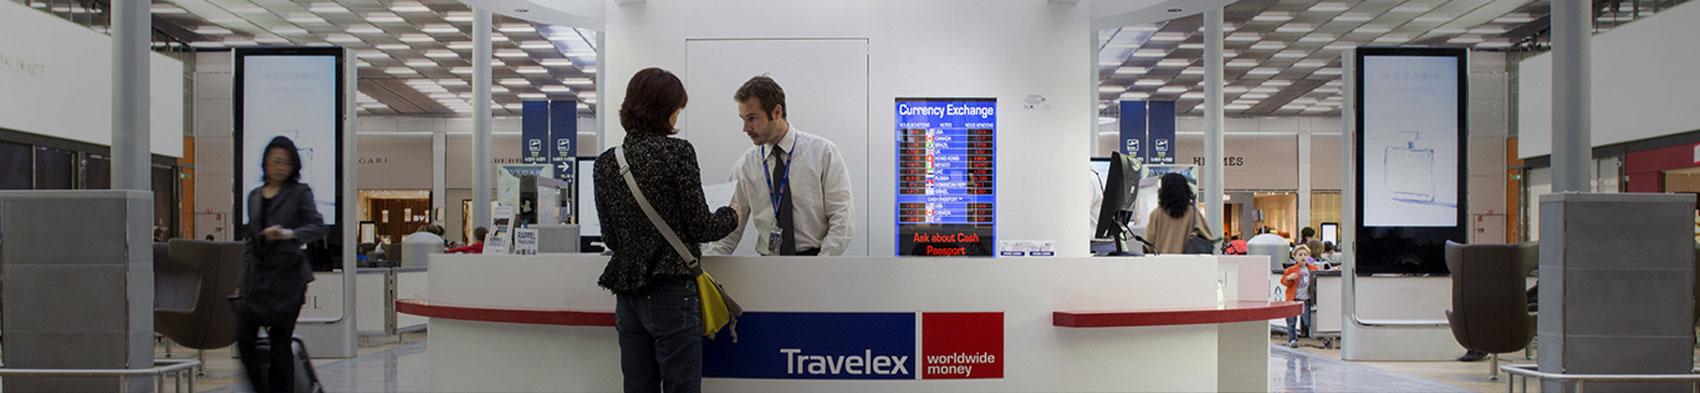 financial services paris aeroport roissy orly logos aeroports de paris